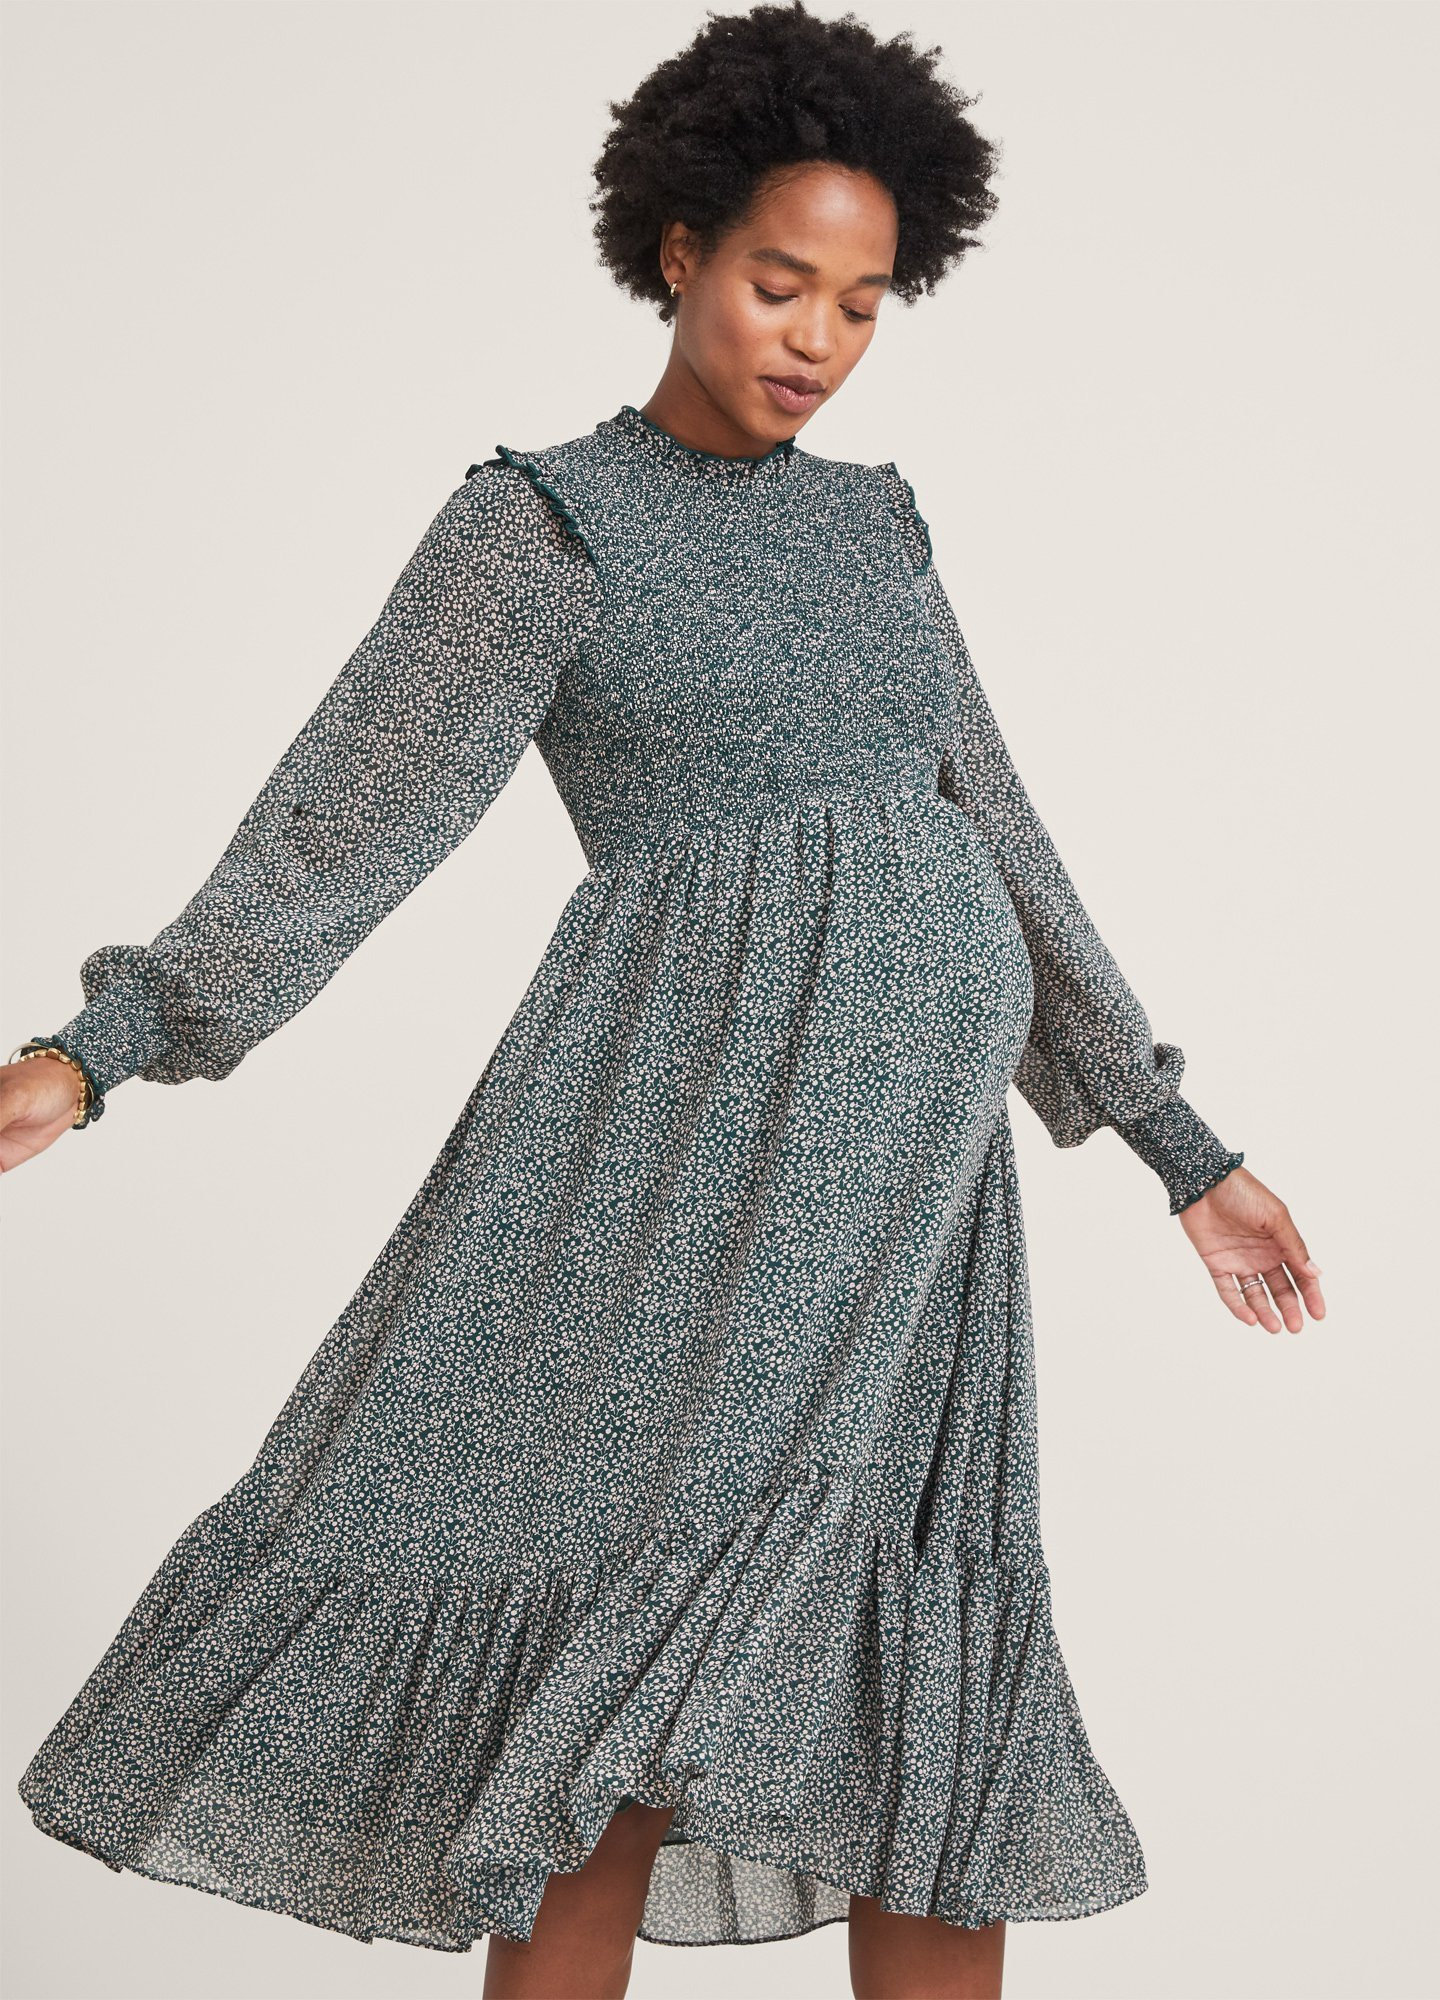 HATCH Maternity The Lana Dress, Forest Ditsy, Size 3